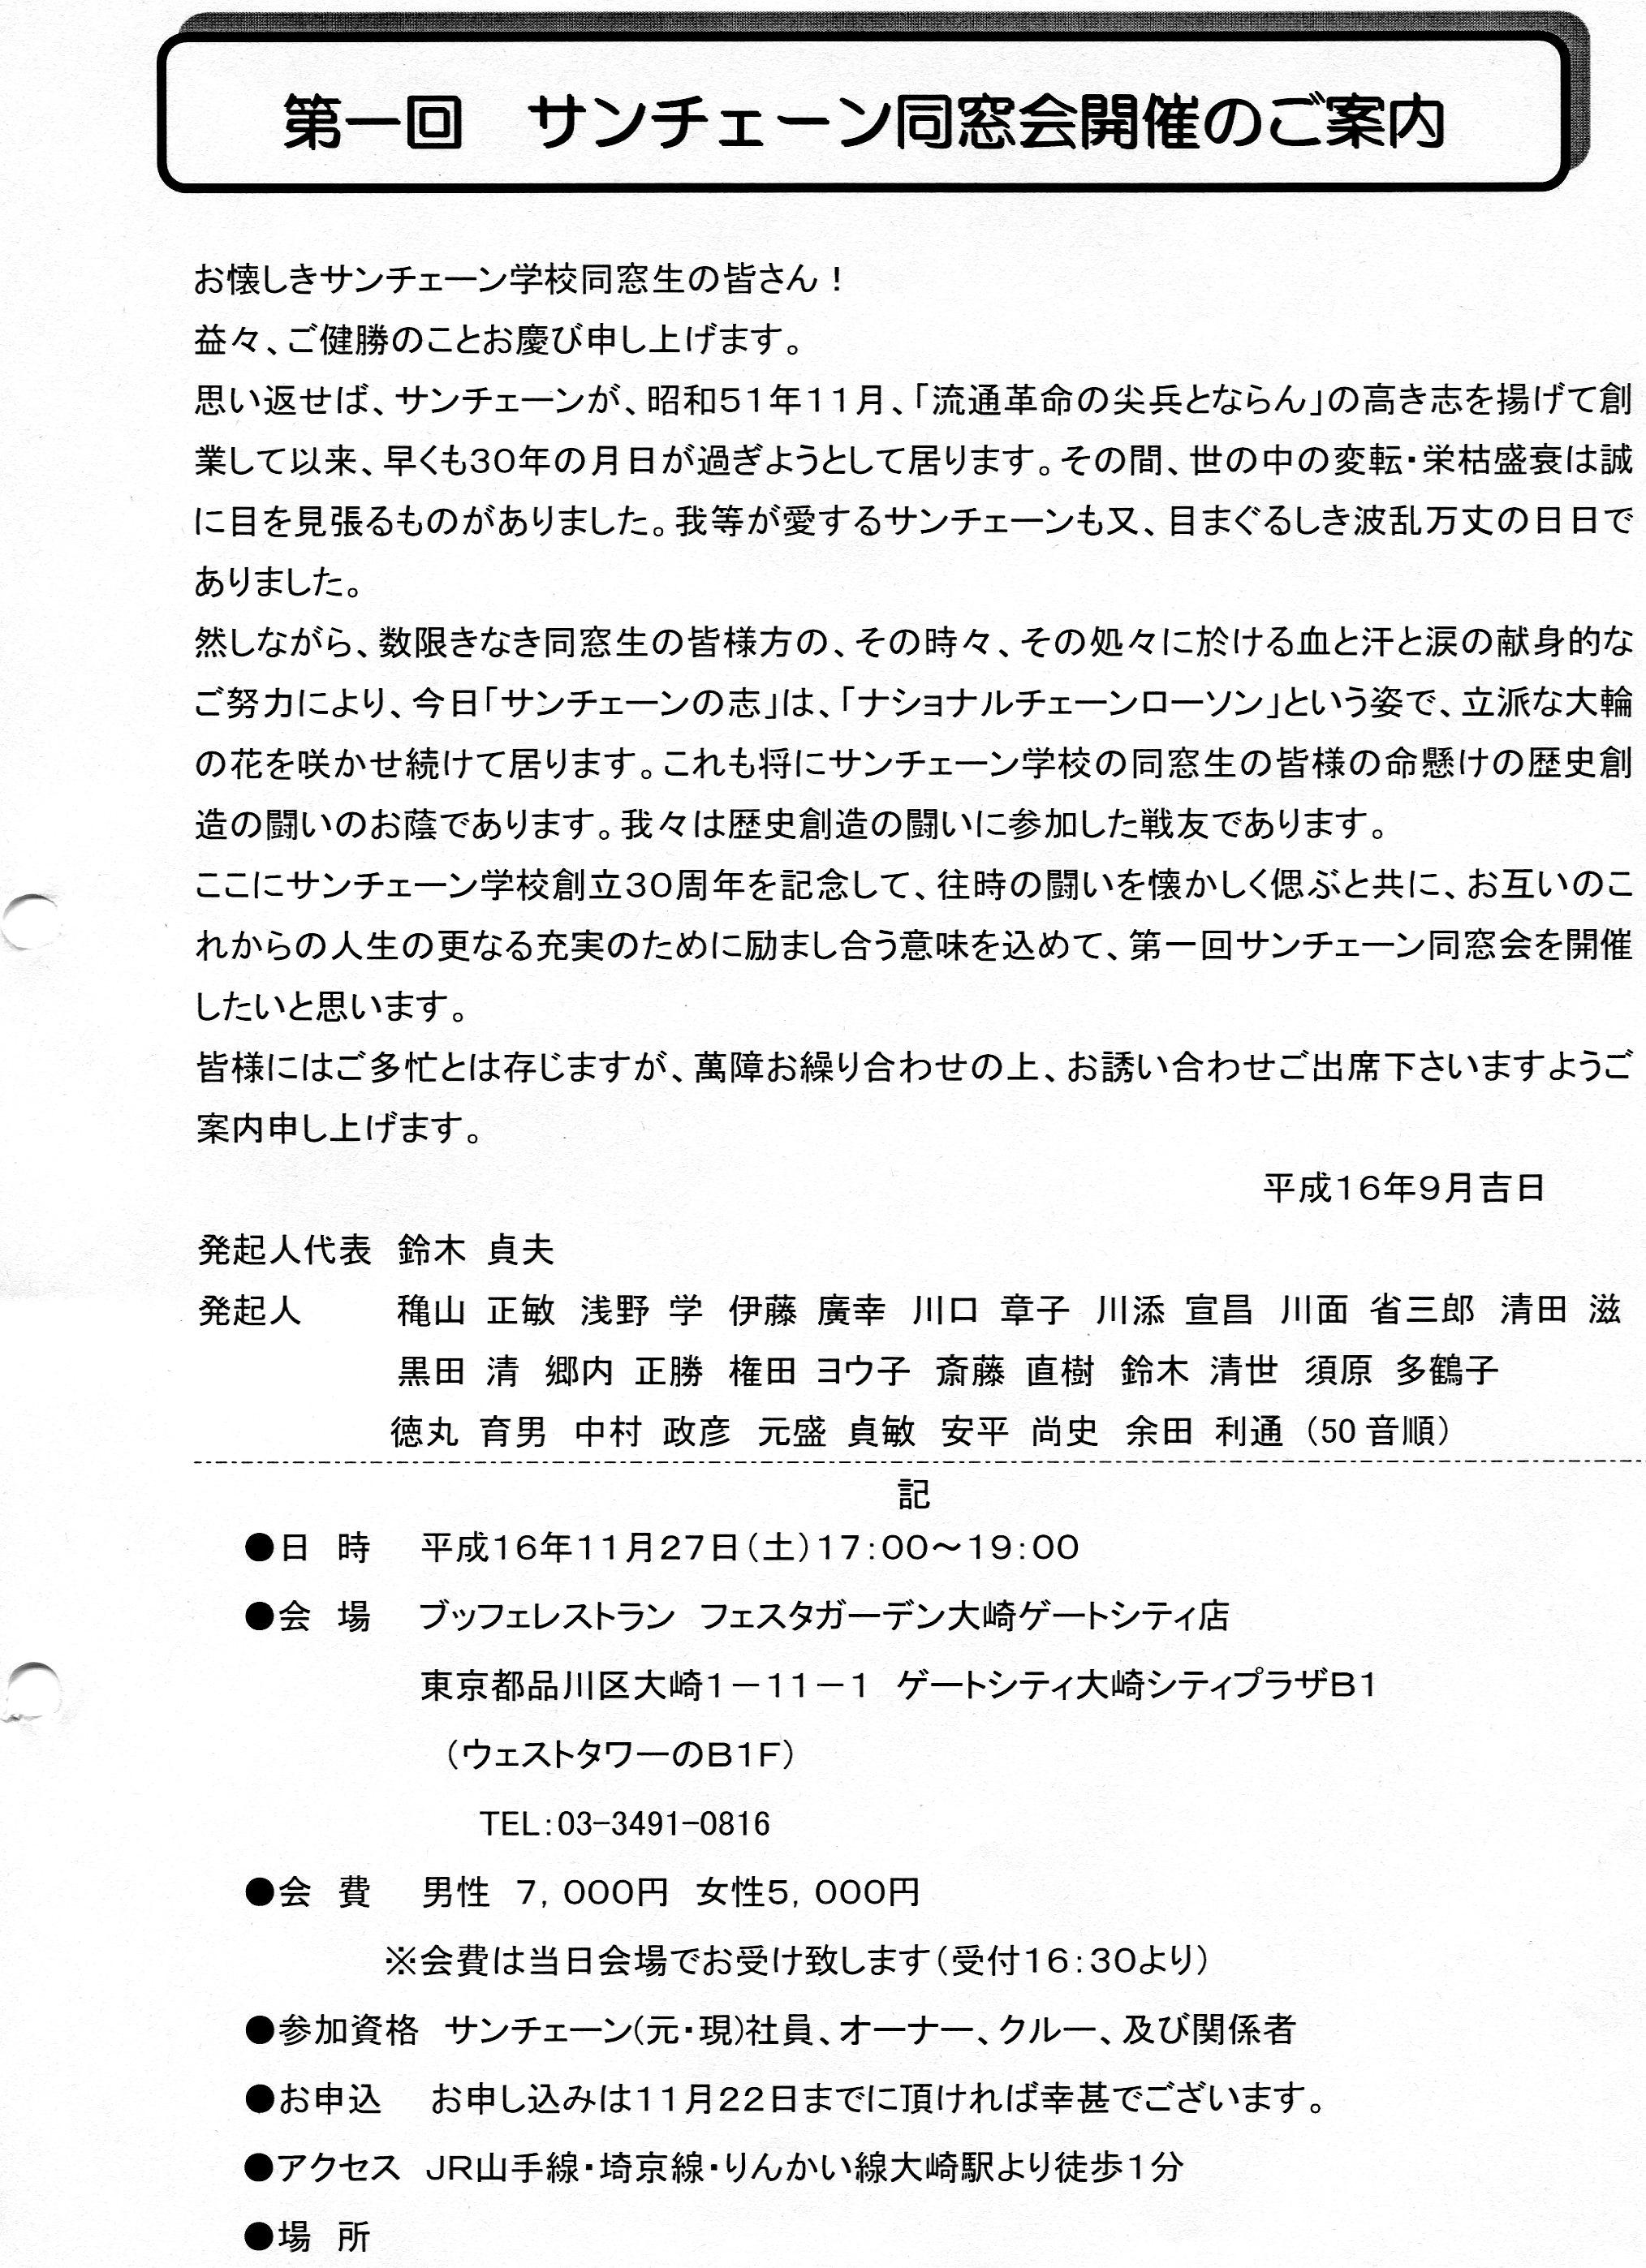 <コンビニ創業戦記・別伝>「DCVS回想録」第44回